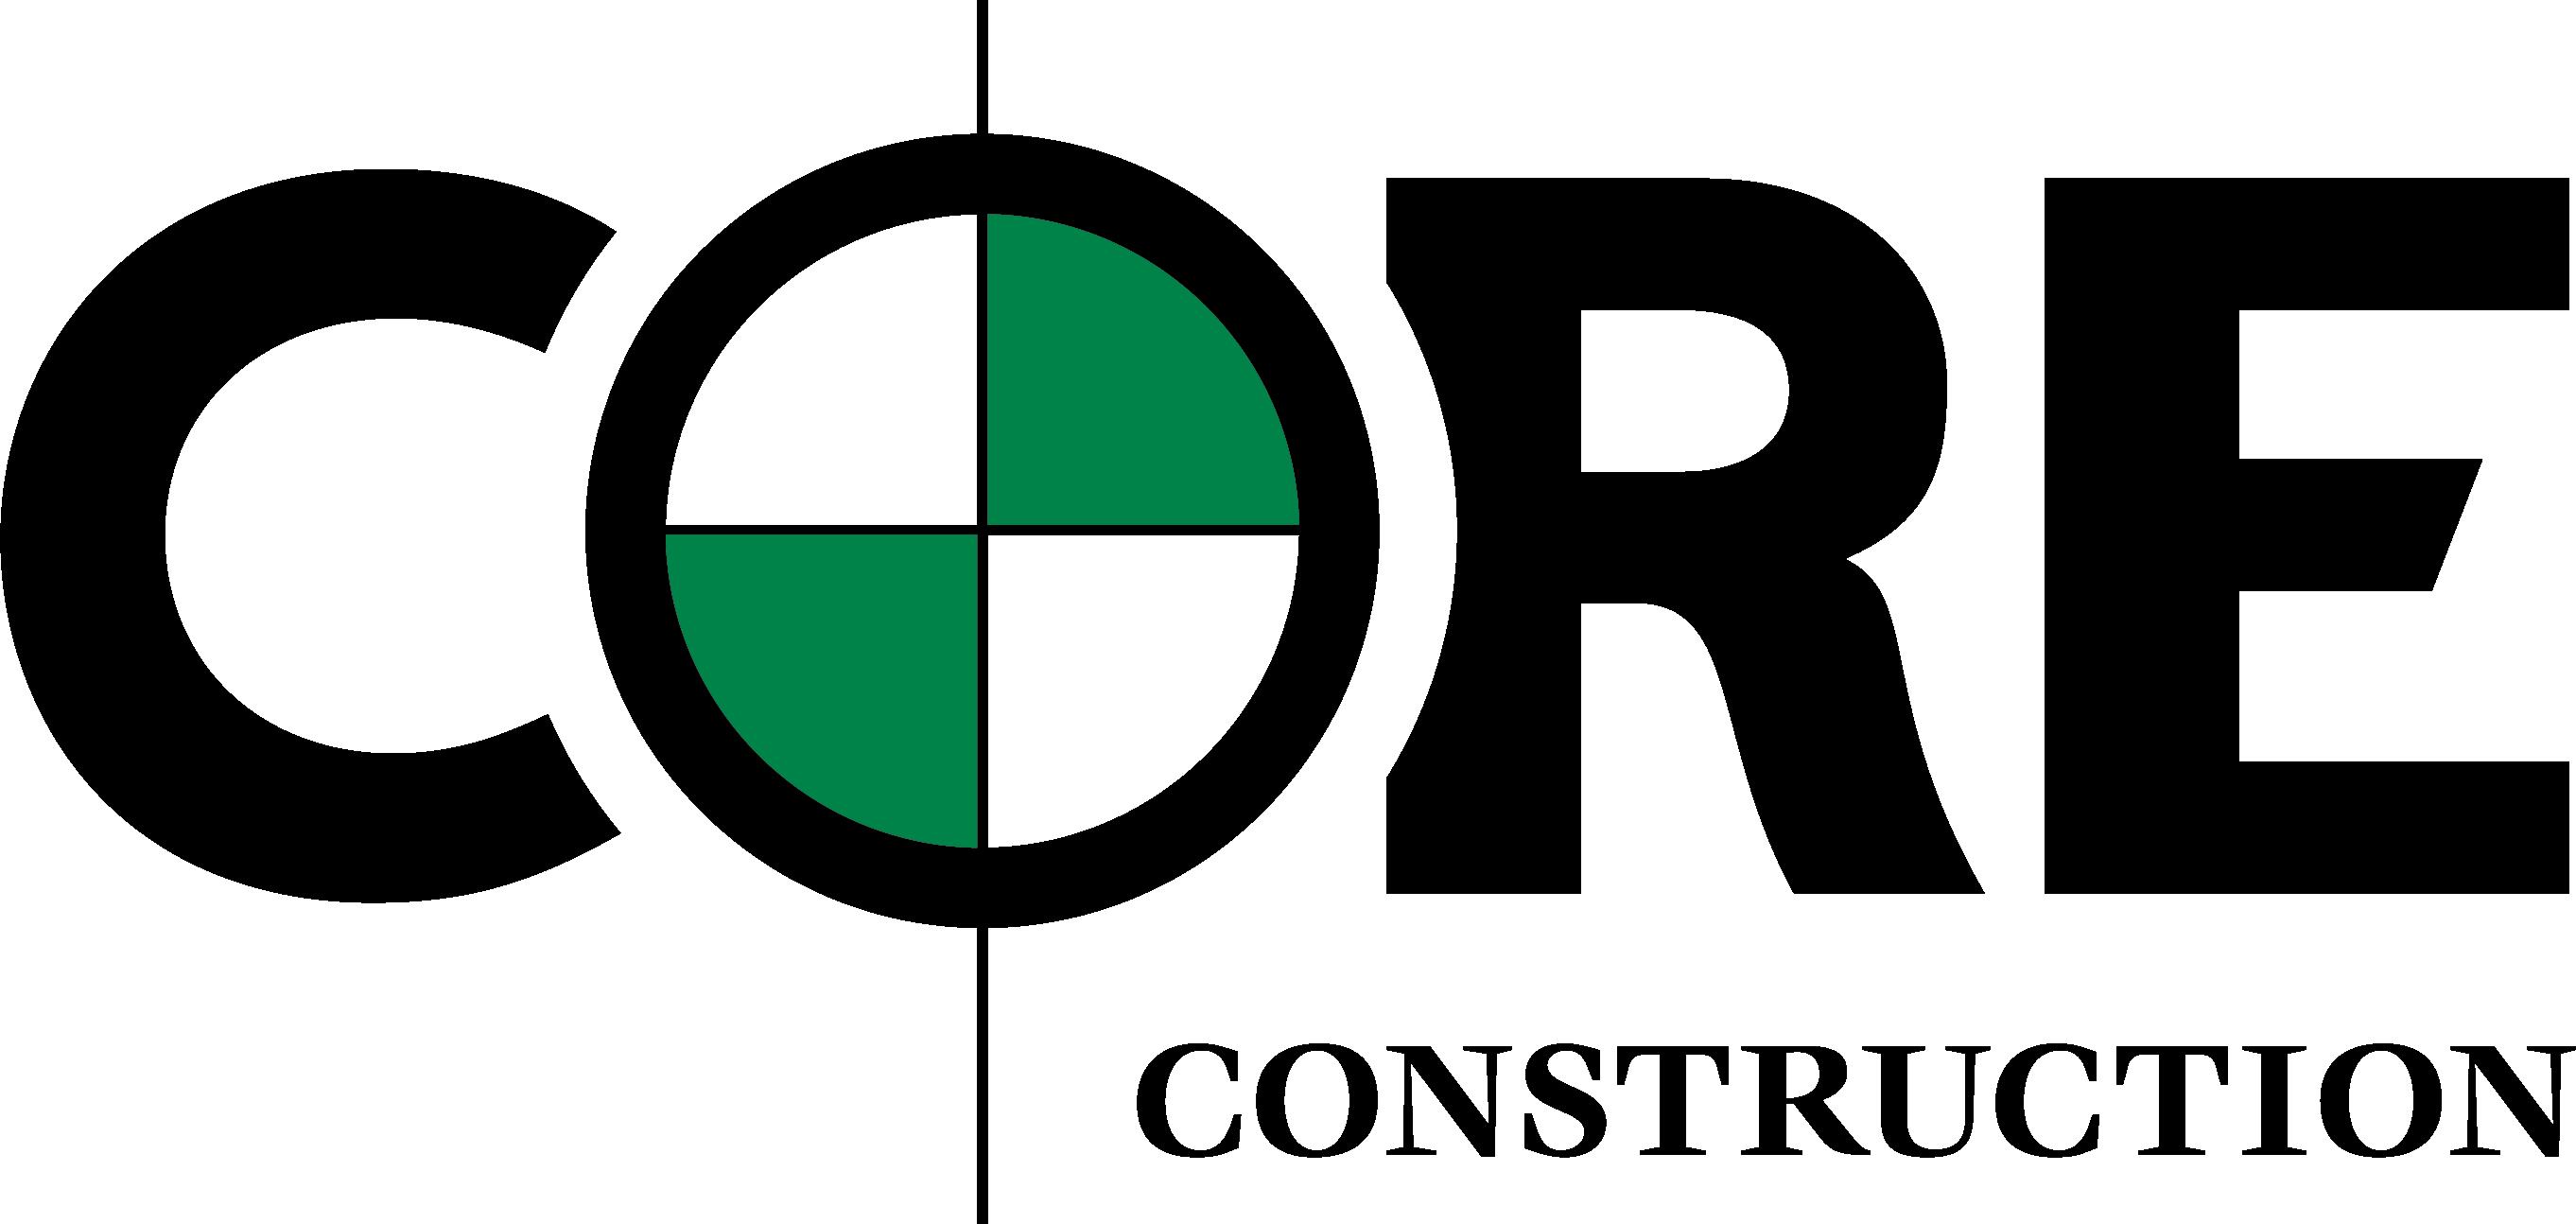 CORE Construction logo